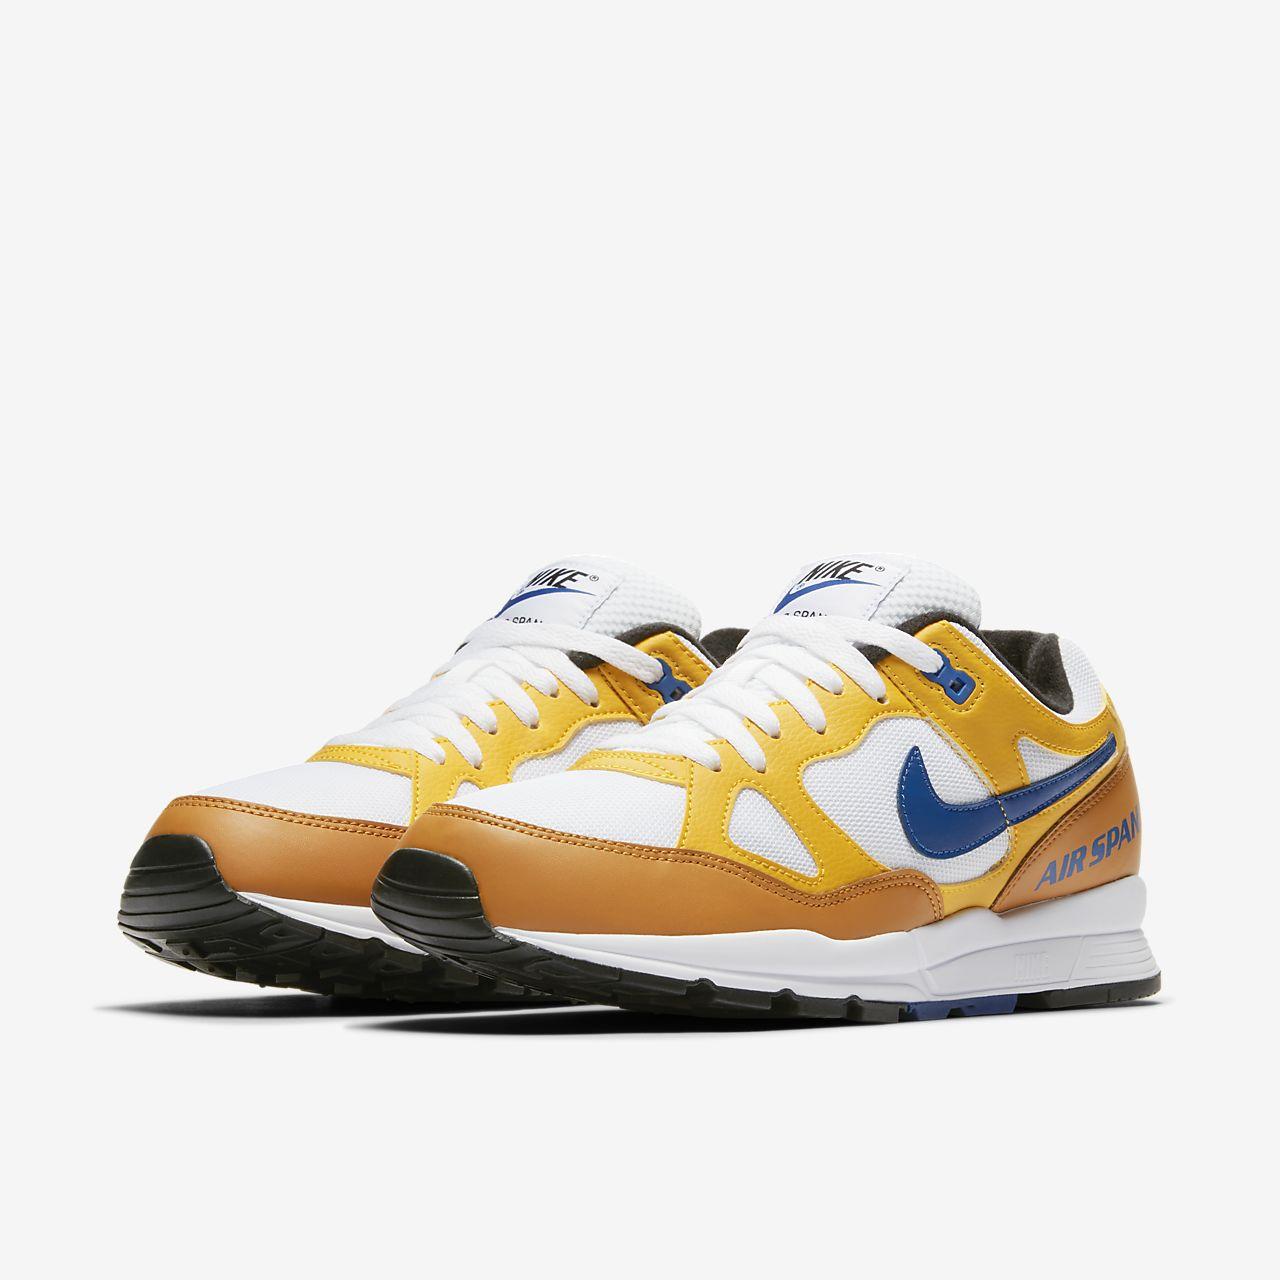 55185423b13 Calzado para hombre Nike Air Span II. Nike.com MX